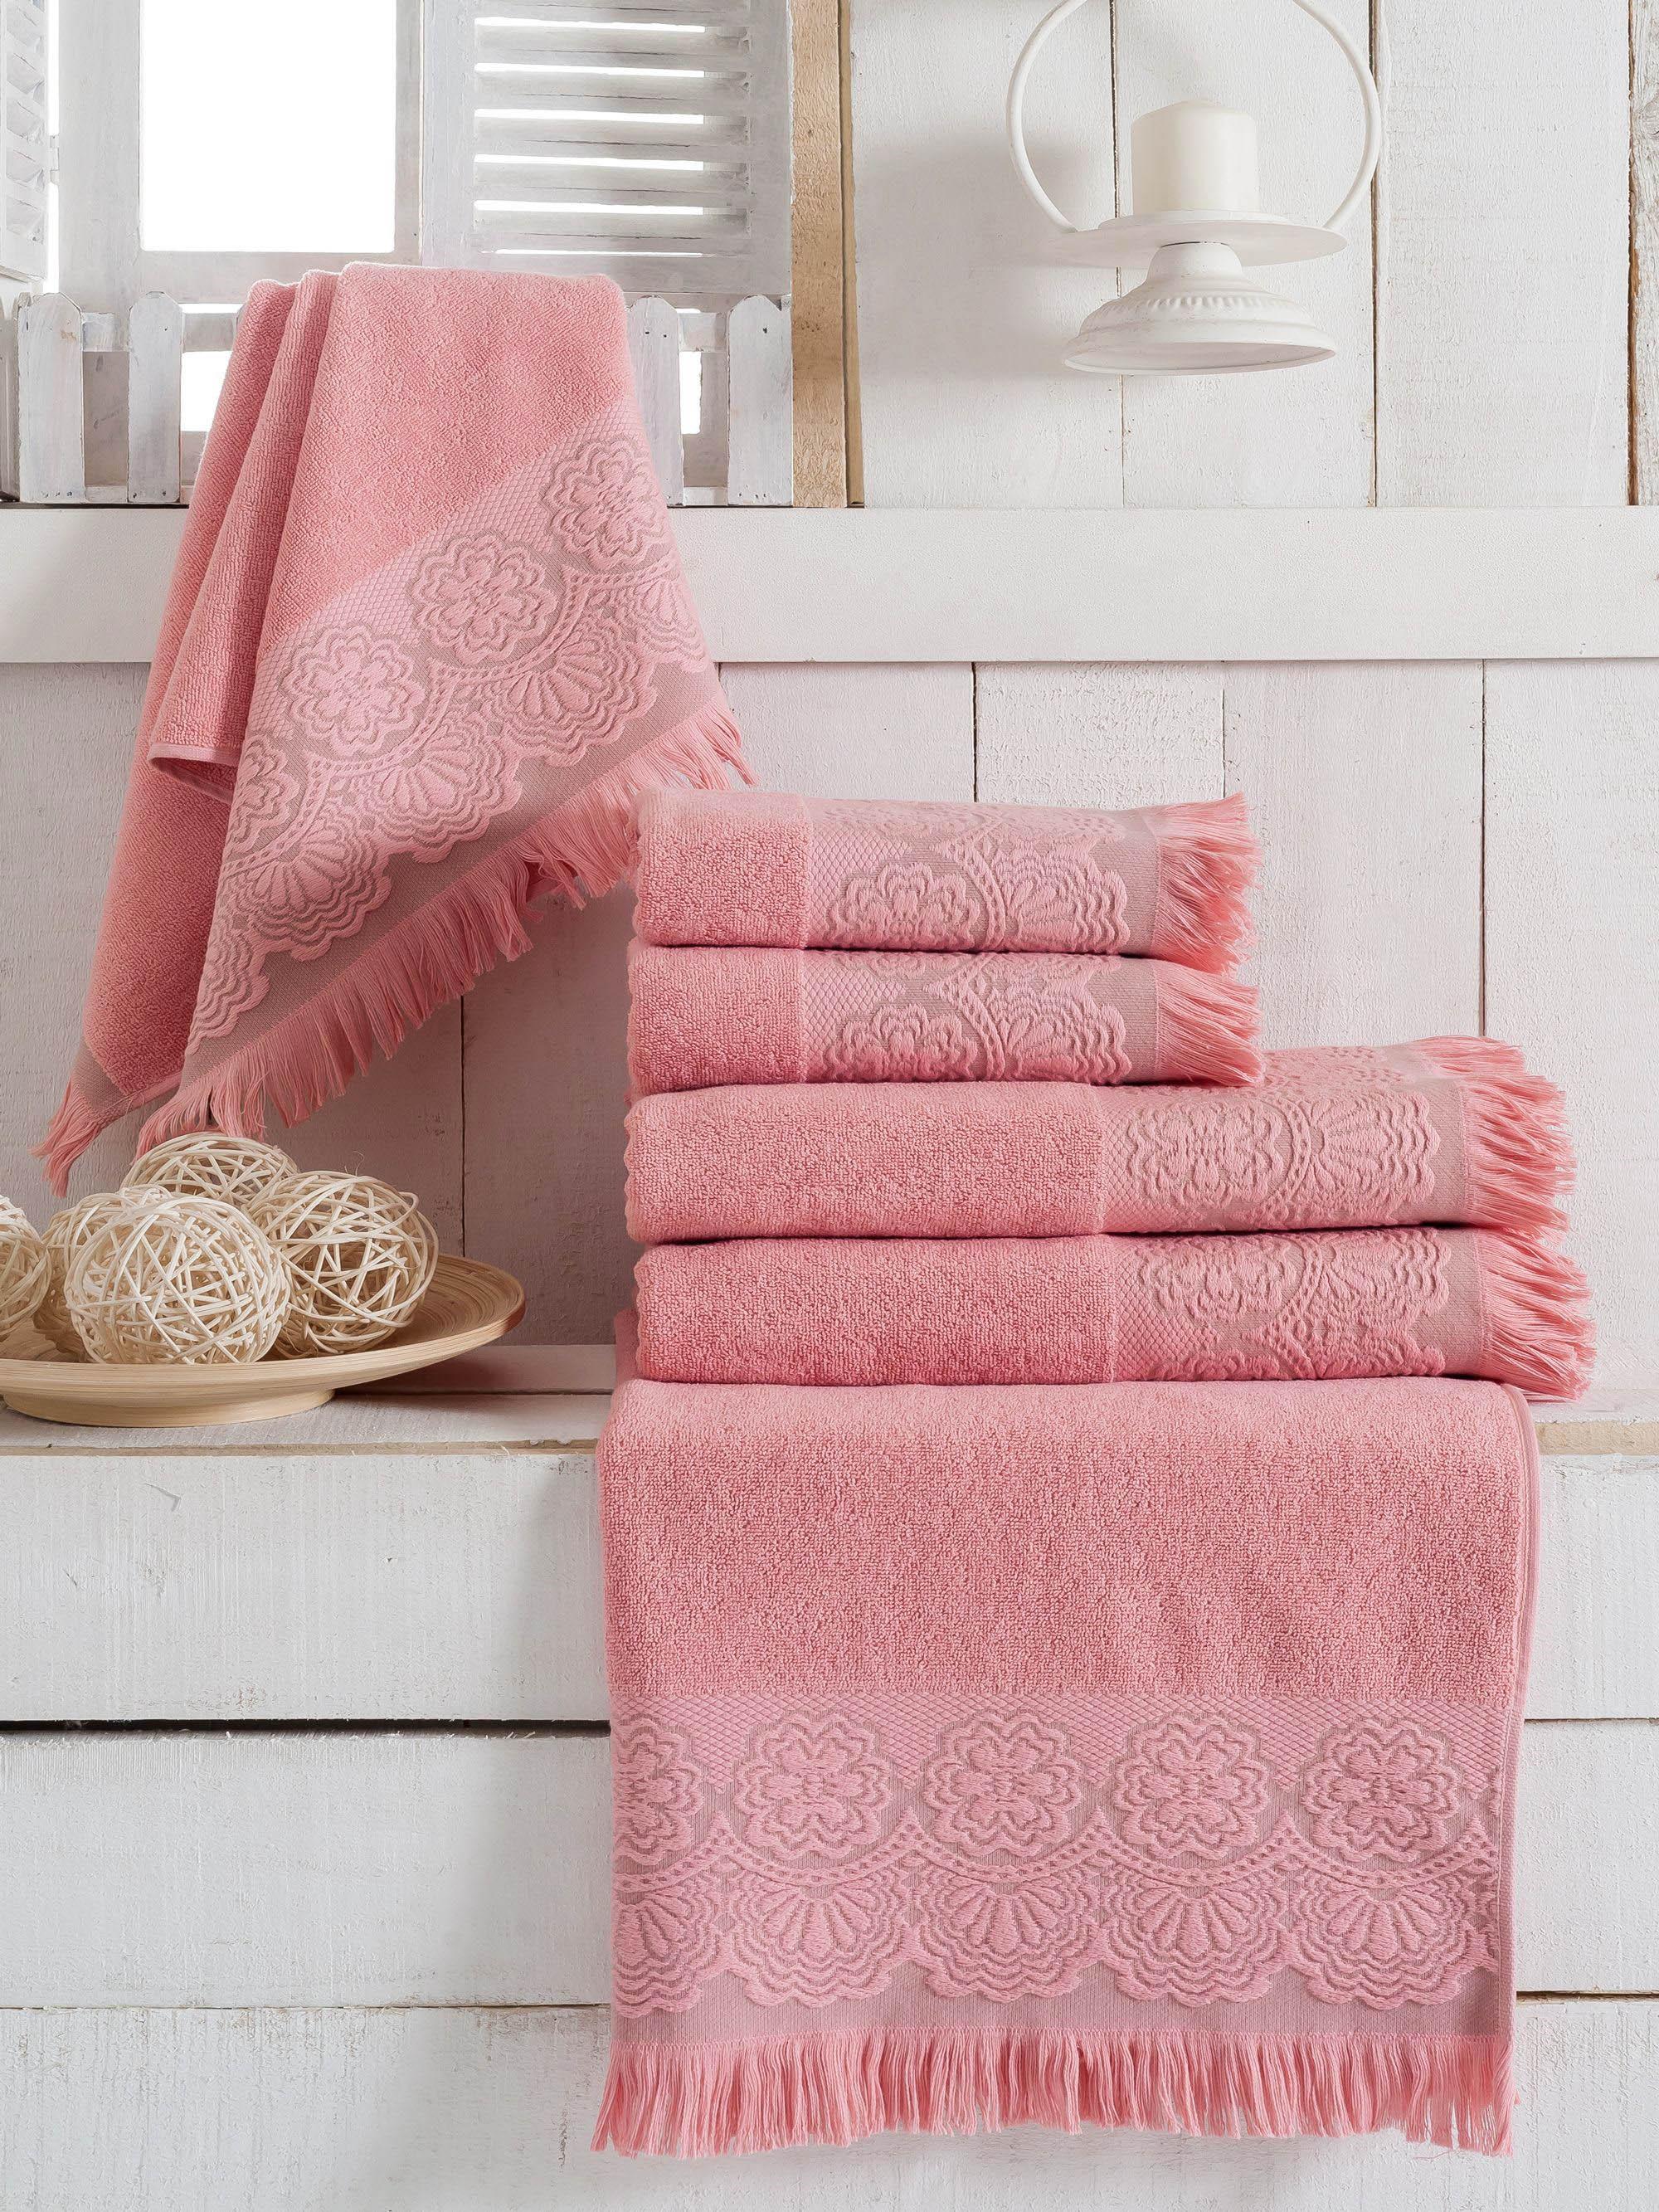 Полотенца Sokuculer Полотенце Zara Цвет: Розовый (70х140 см - 3 шт) pasta zara ракушка макароны 500 г